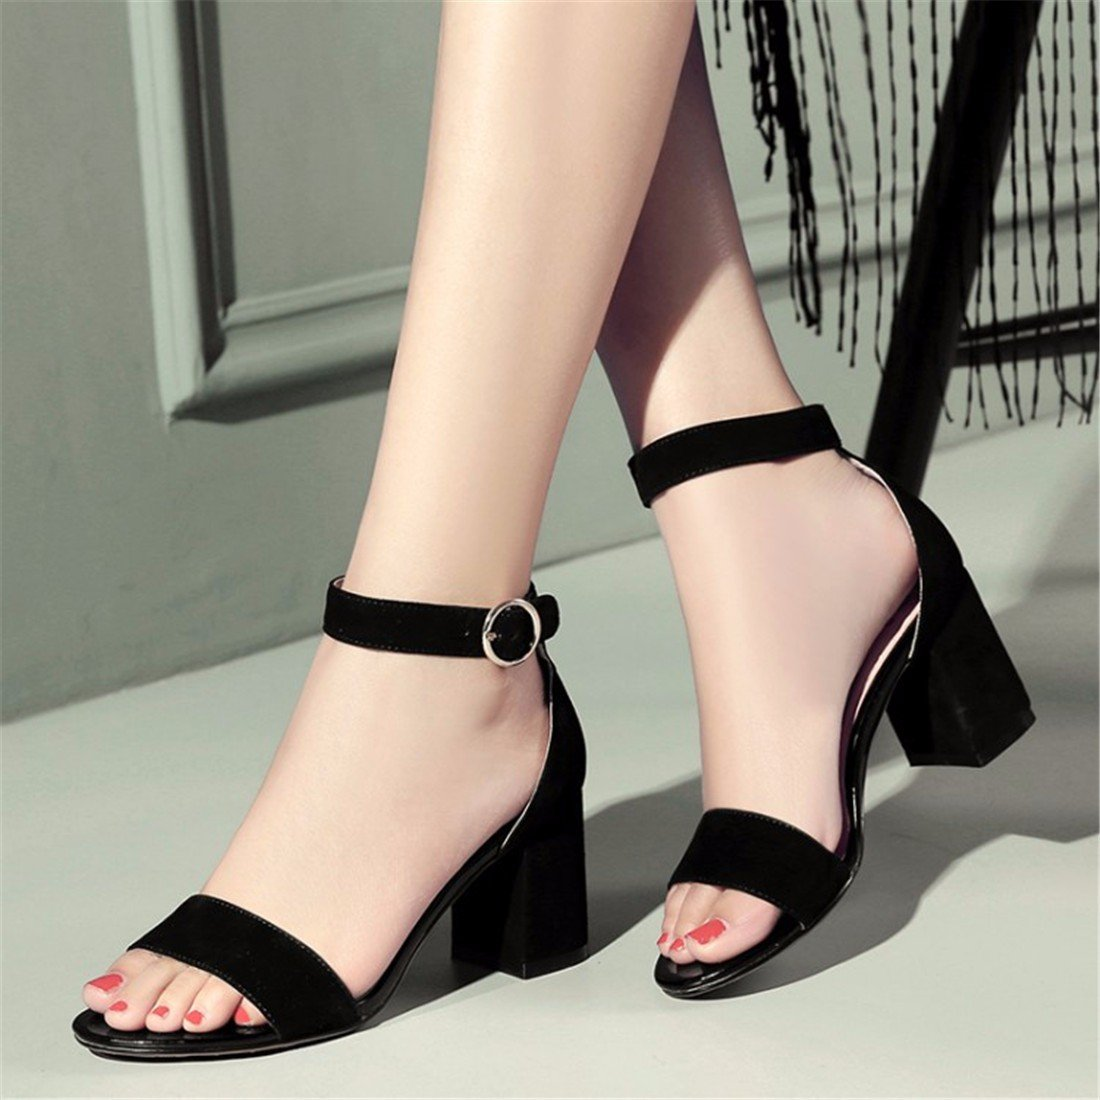 Frau Damen Sandalen Leder Sandalen Dick mit Hochhackigen Sandalen Gurt Tau-Toe Sandalen